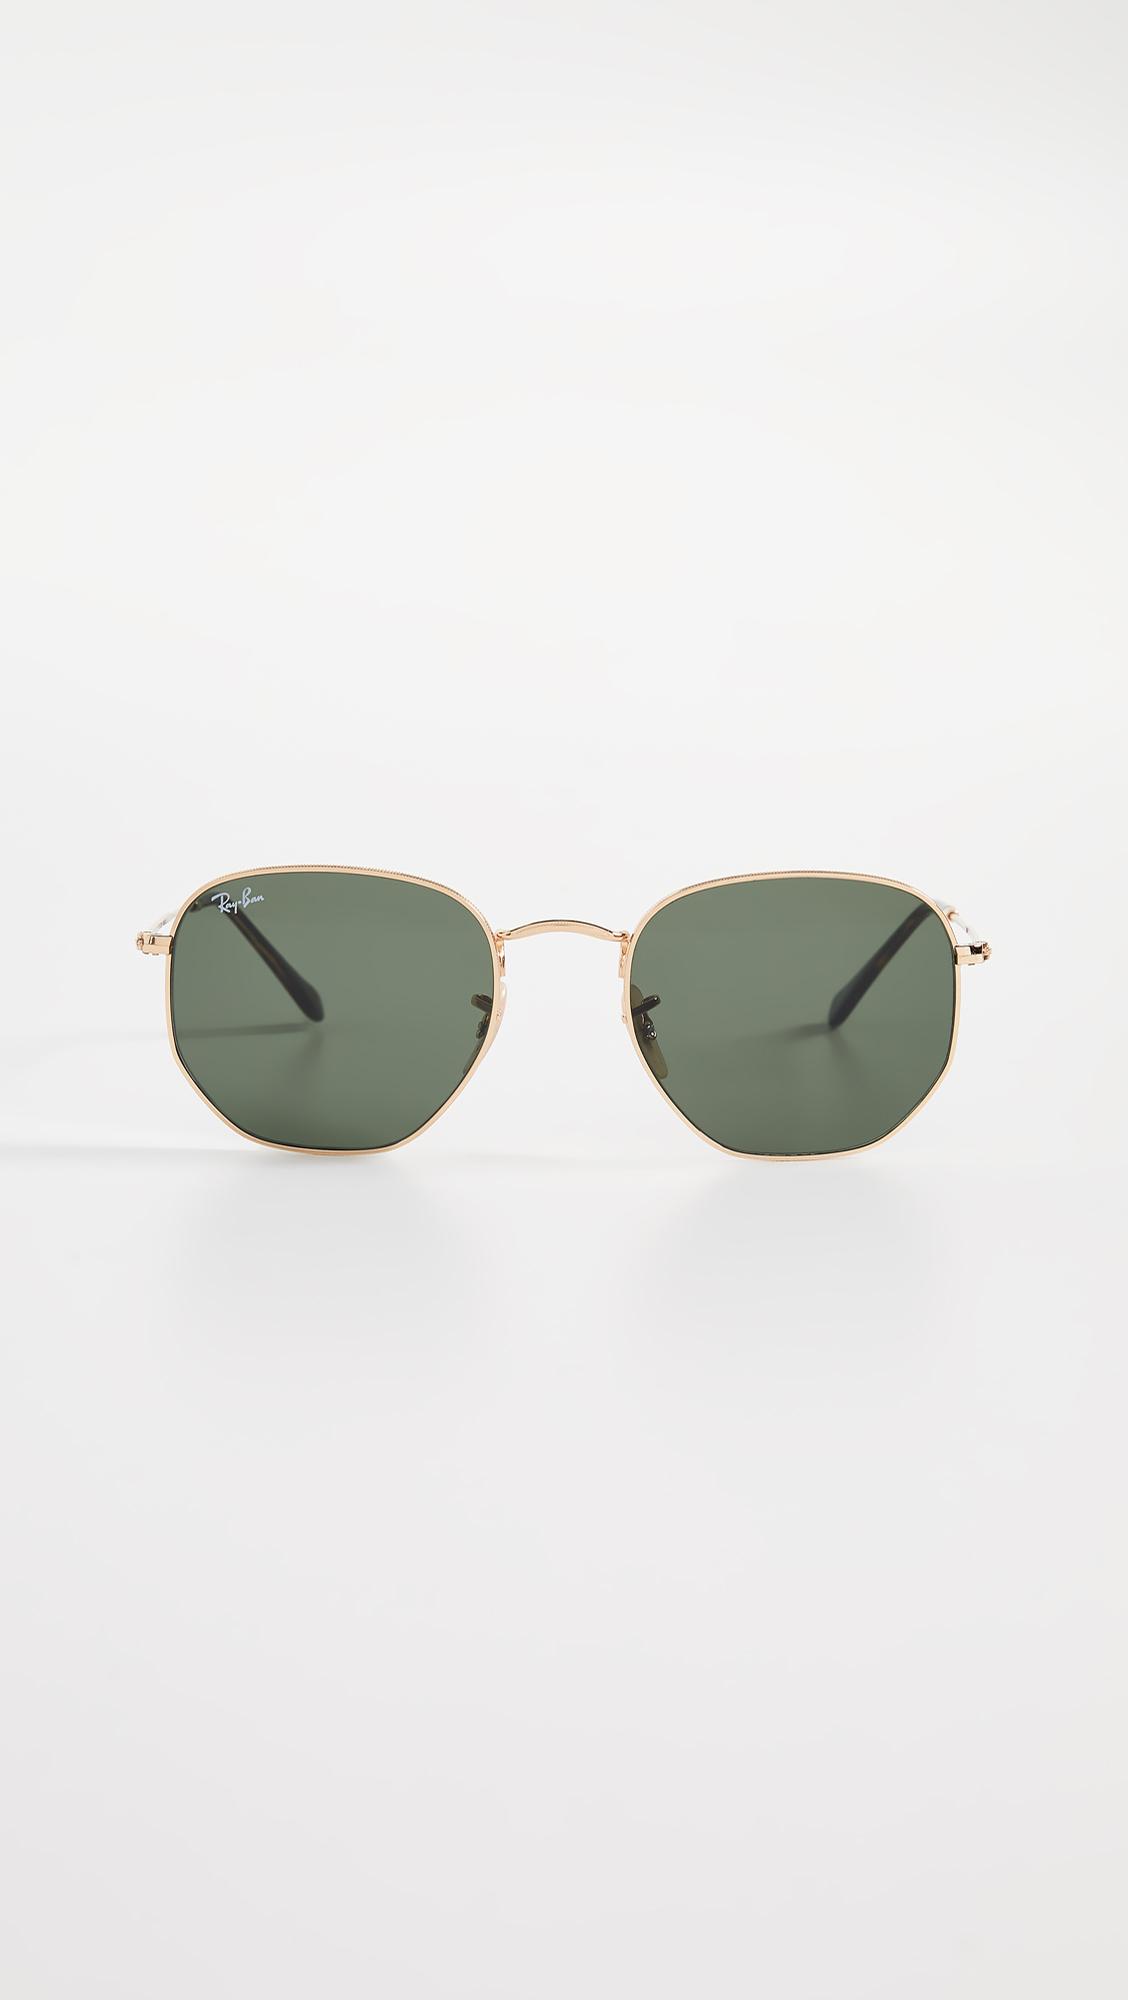 7f47aa54d83 Ray-Ban RB3548N Hexagonal Sunglasses